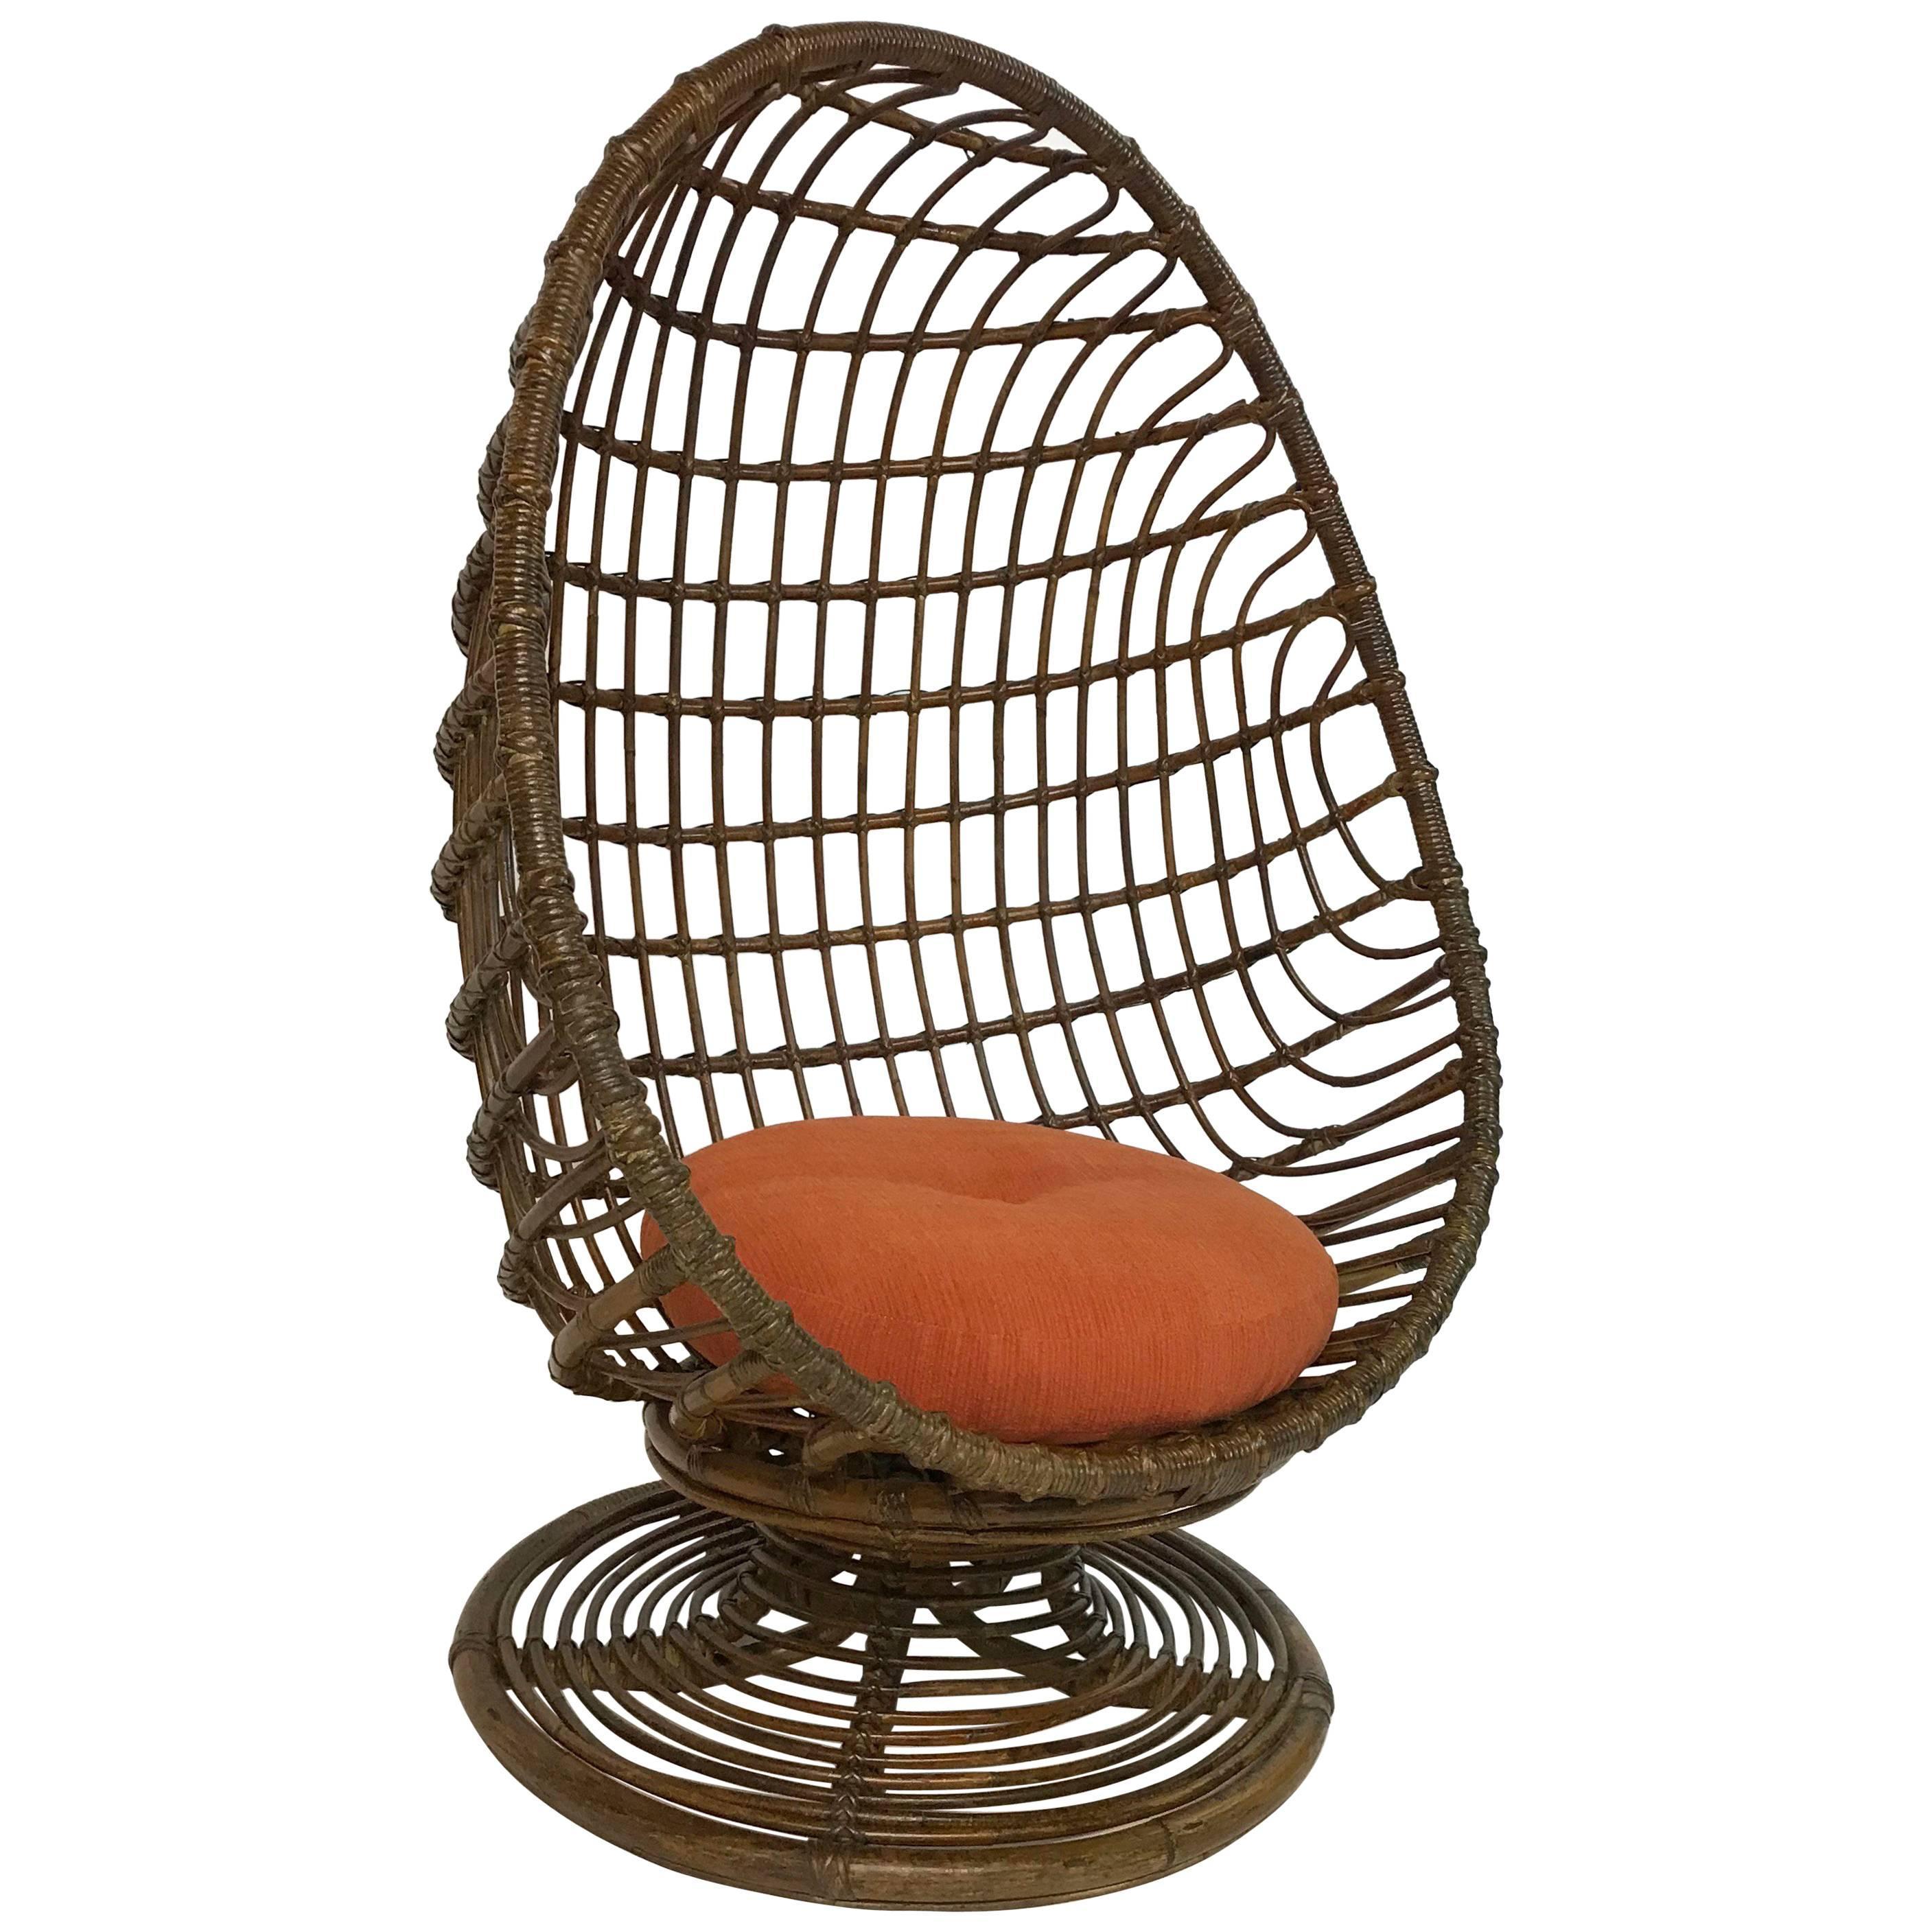 Charmant Mid Century Woven Rattan Egg Chair